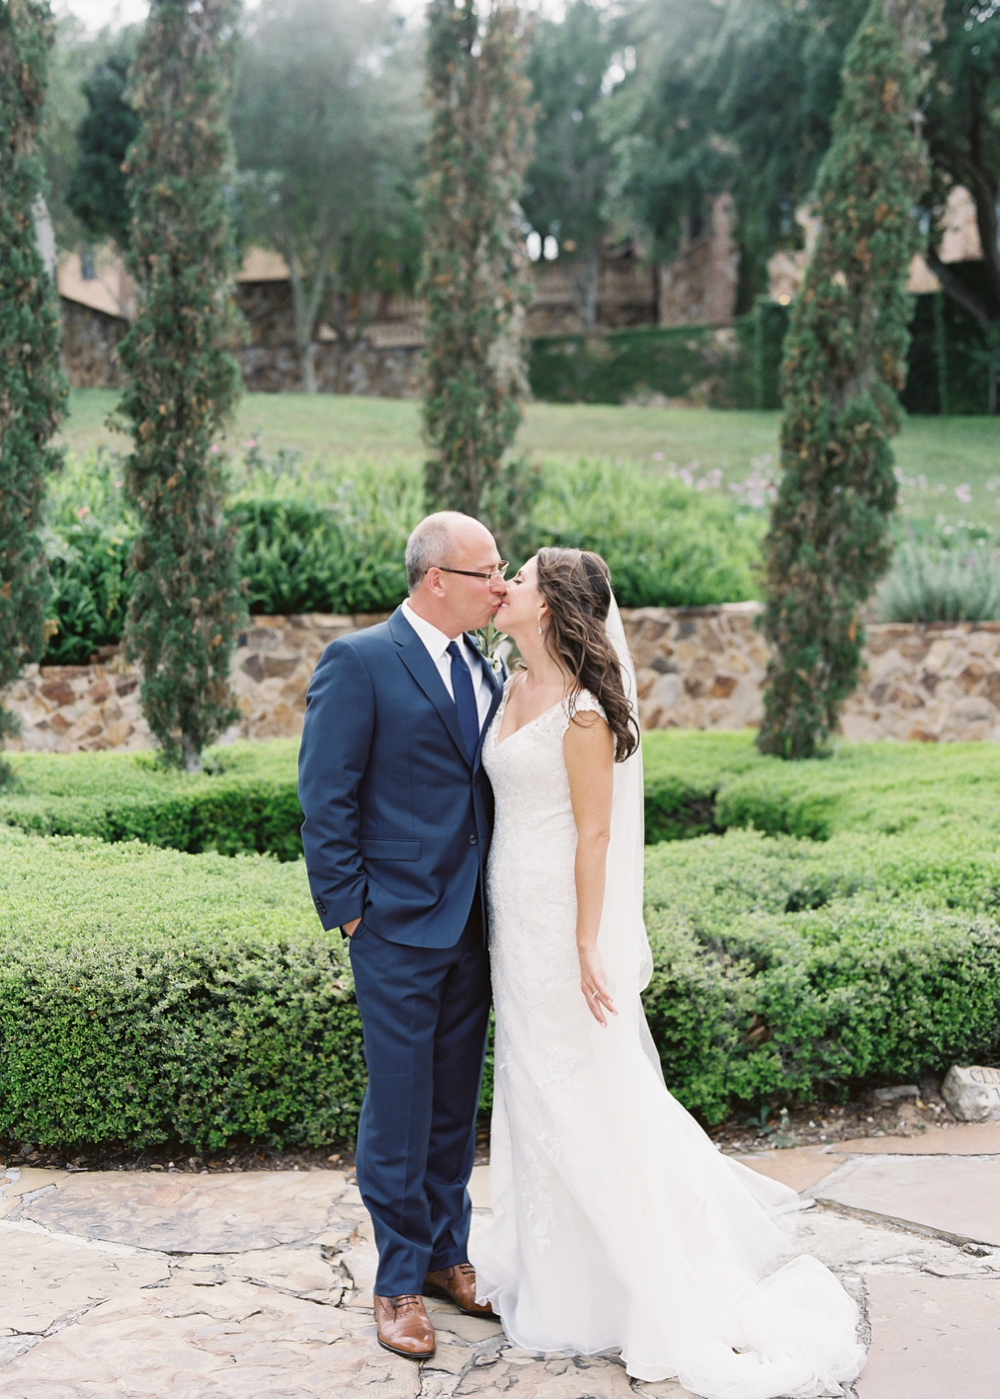 Vicki+Grafton+Photography+-+Fine+Art+Film+Wedding+Photographer+-+Bella+Collina+Wedding_0038.jpg